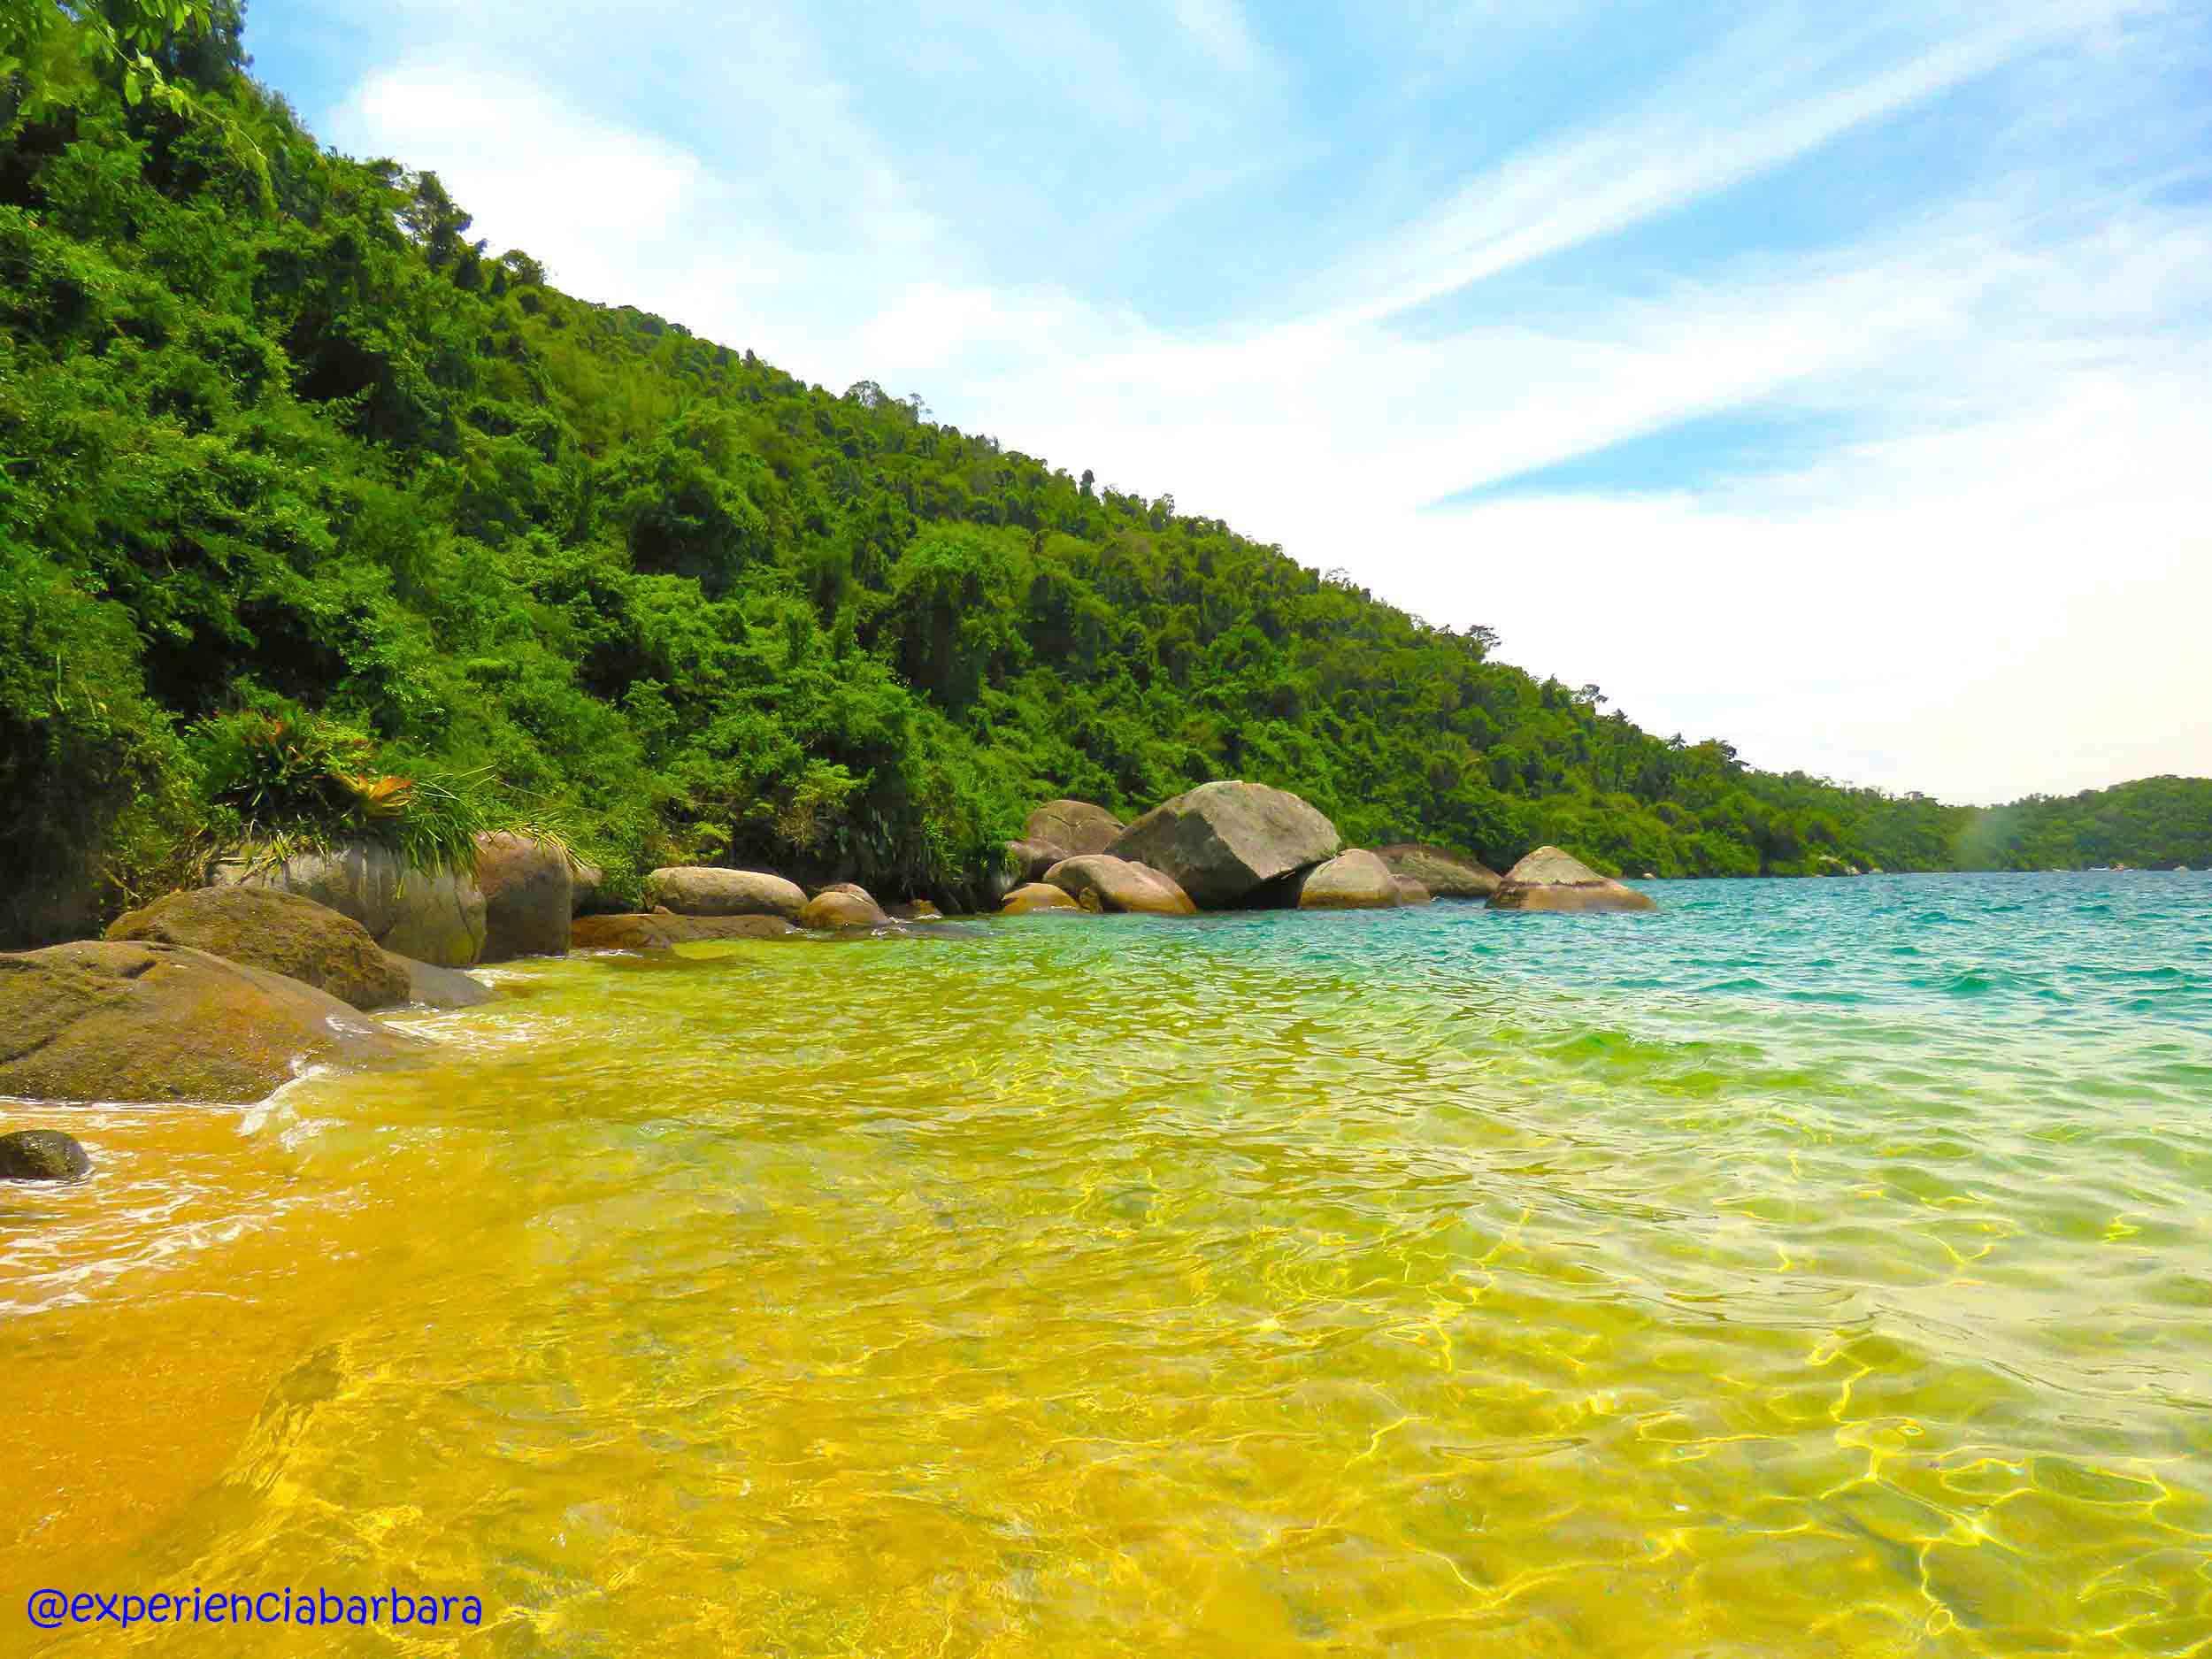 Passeio de lancha Paraty - Praia Saco da Velha